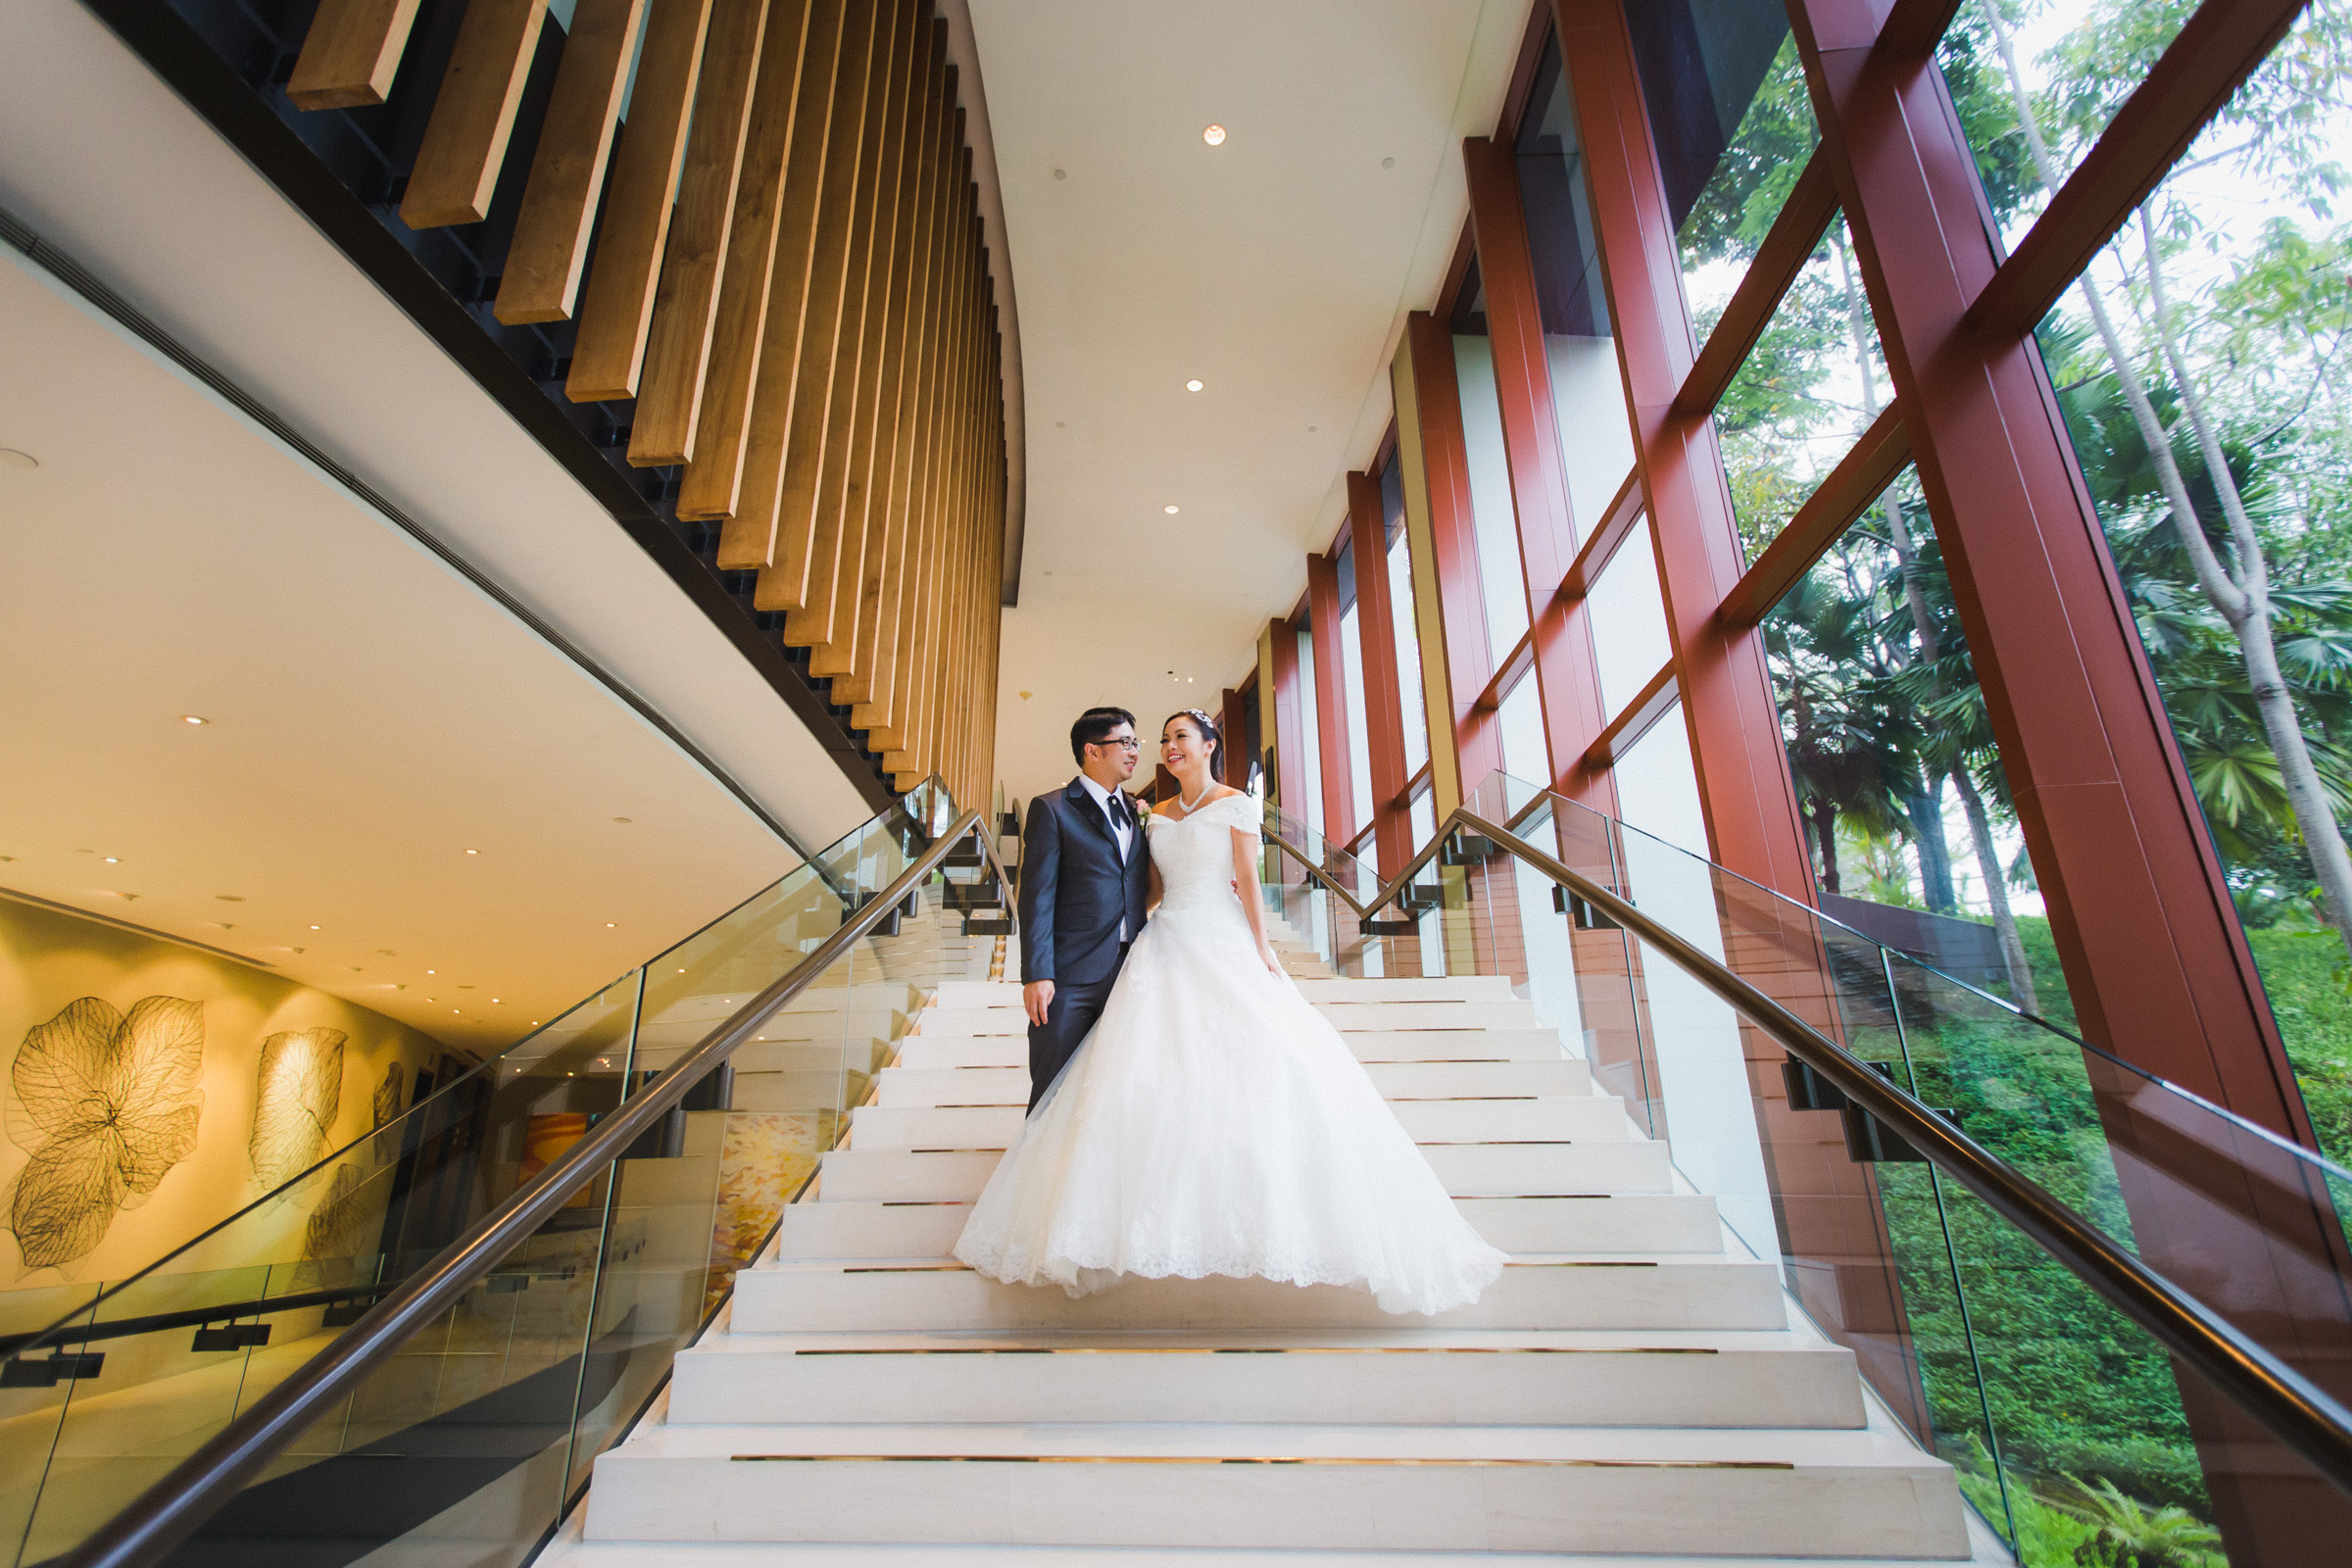 Steven_Jasmine_Wedding_Walldrobe Photography_Wedding shoots_Actual day wedding_Photographer (31)